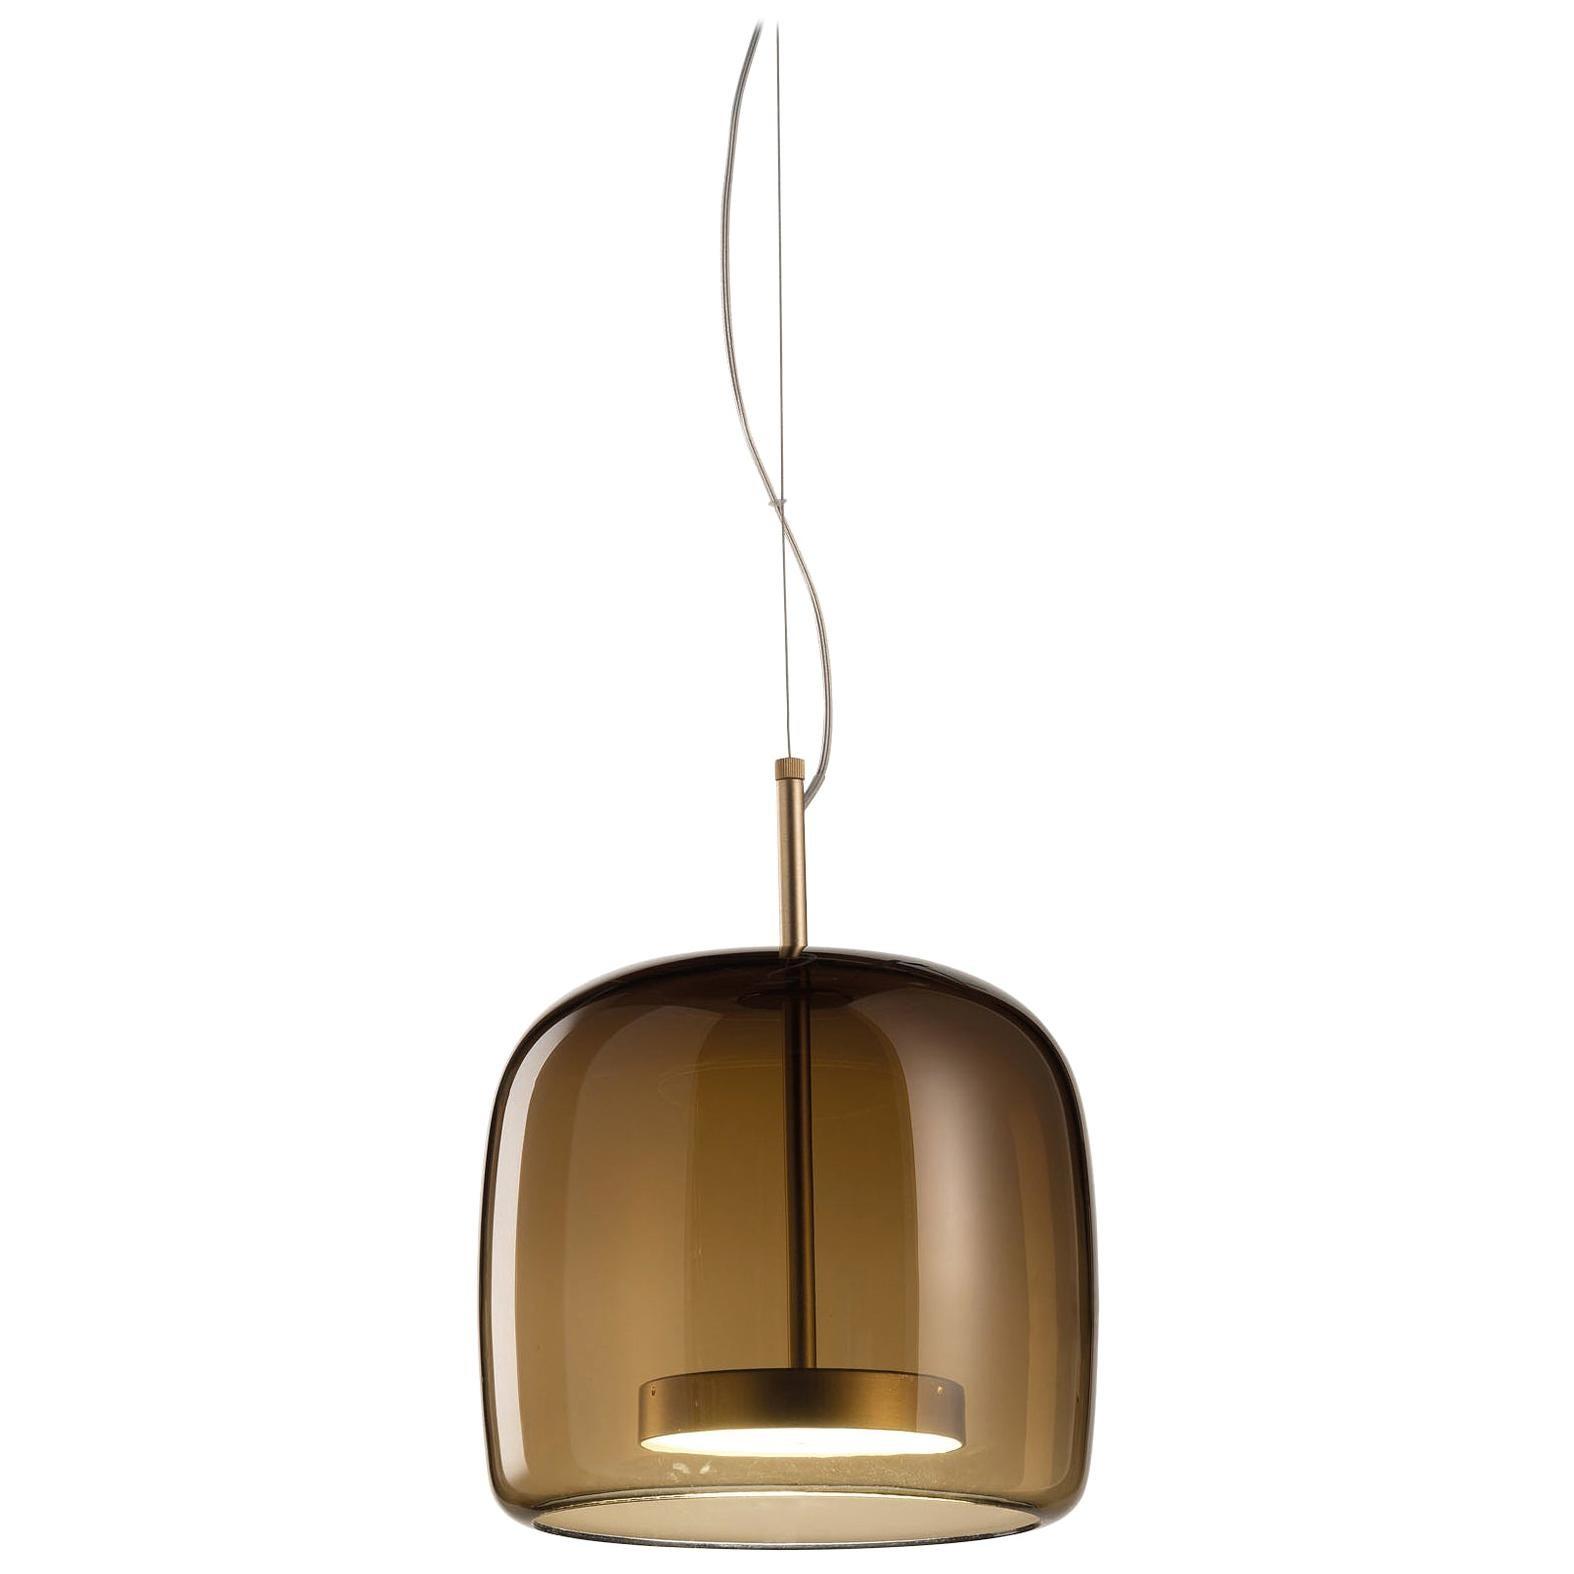 Vistosi Tall LED Jube Pendant Light in Brown by Favaretto & Partners